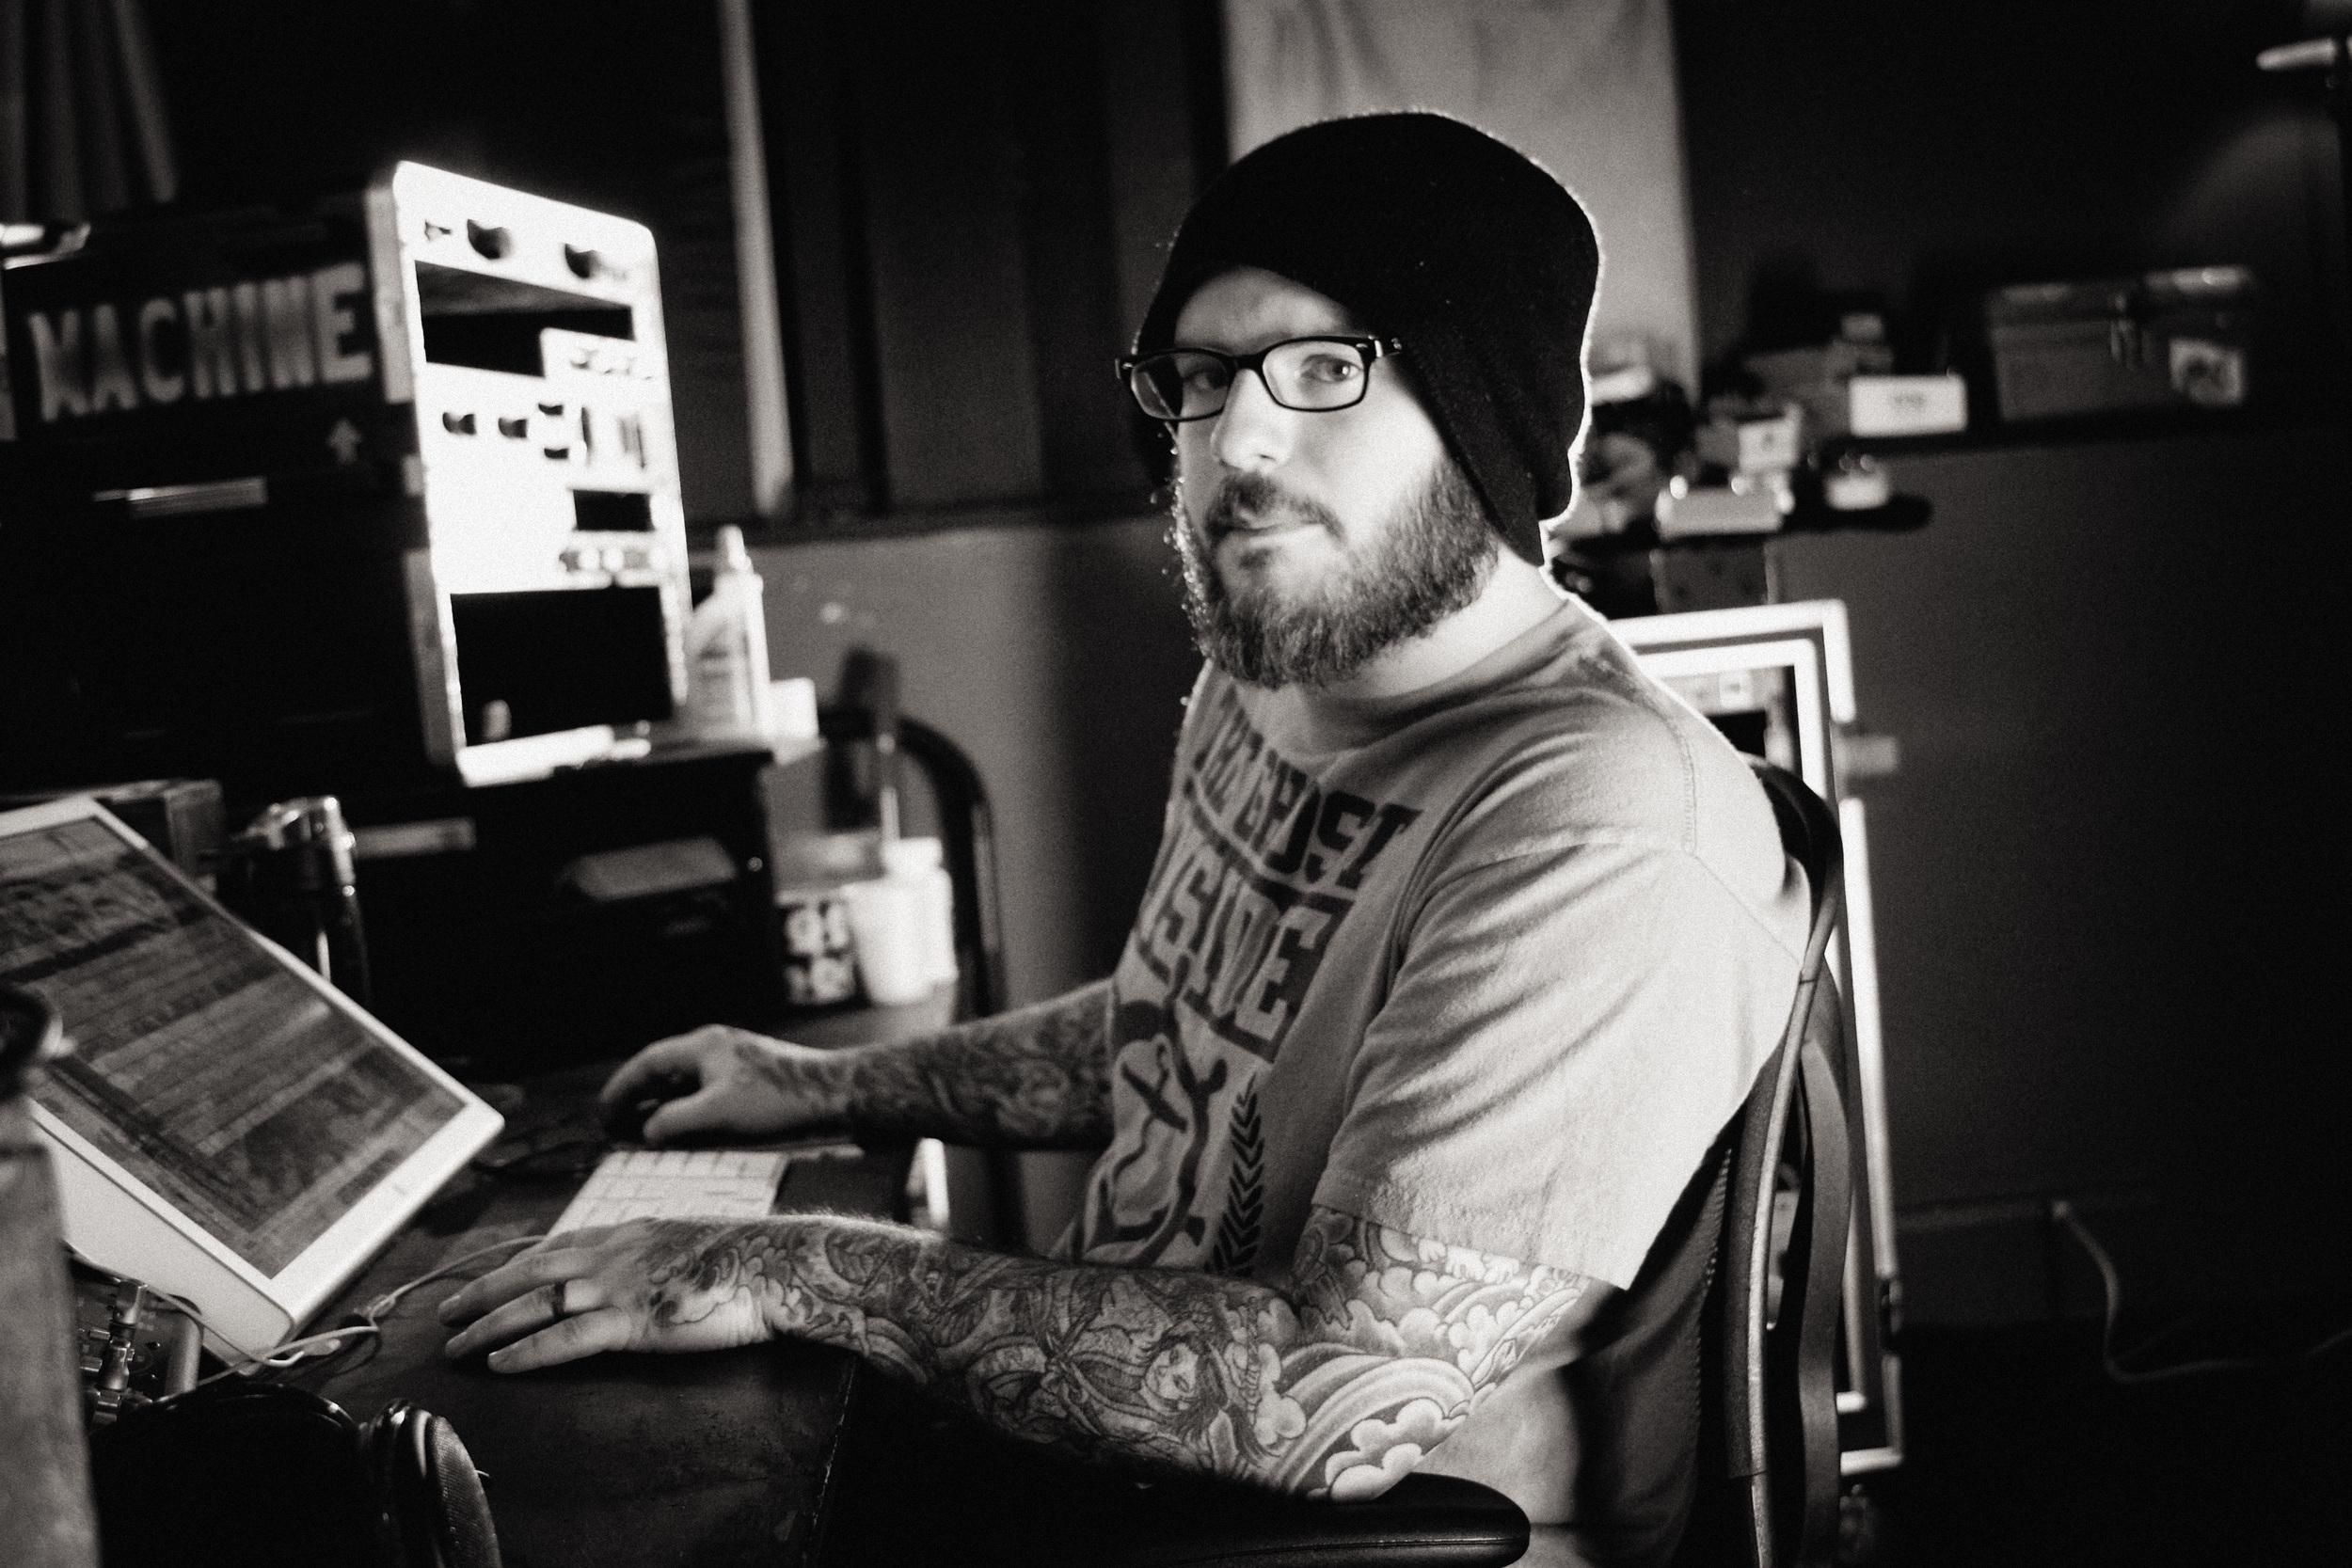 Producer Will Putney